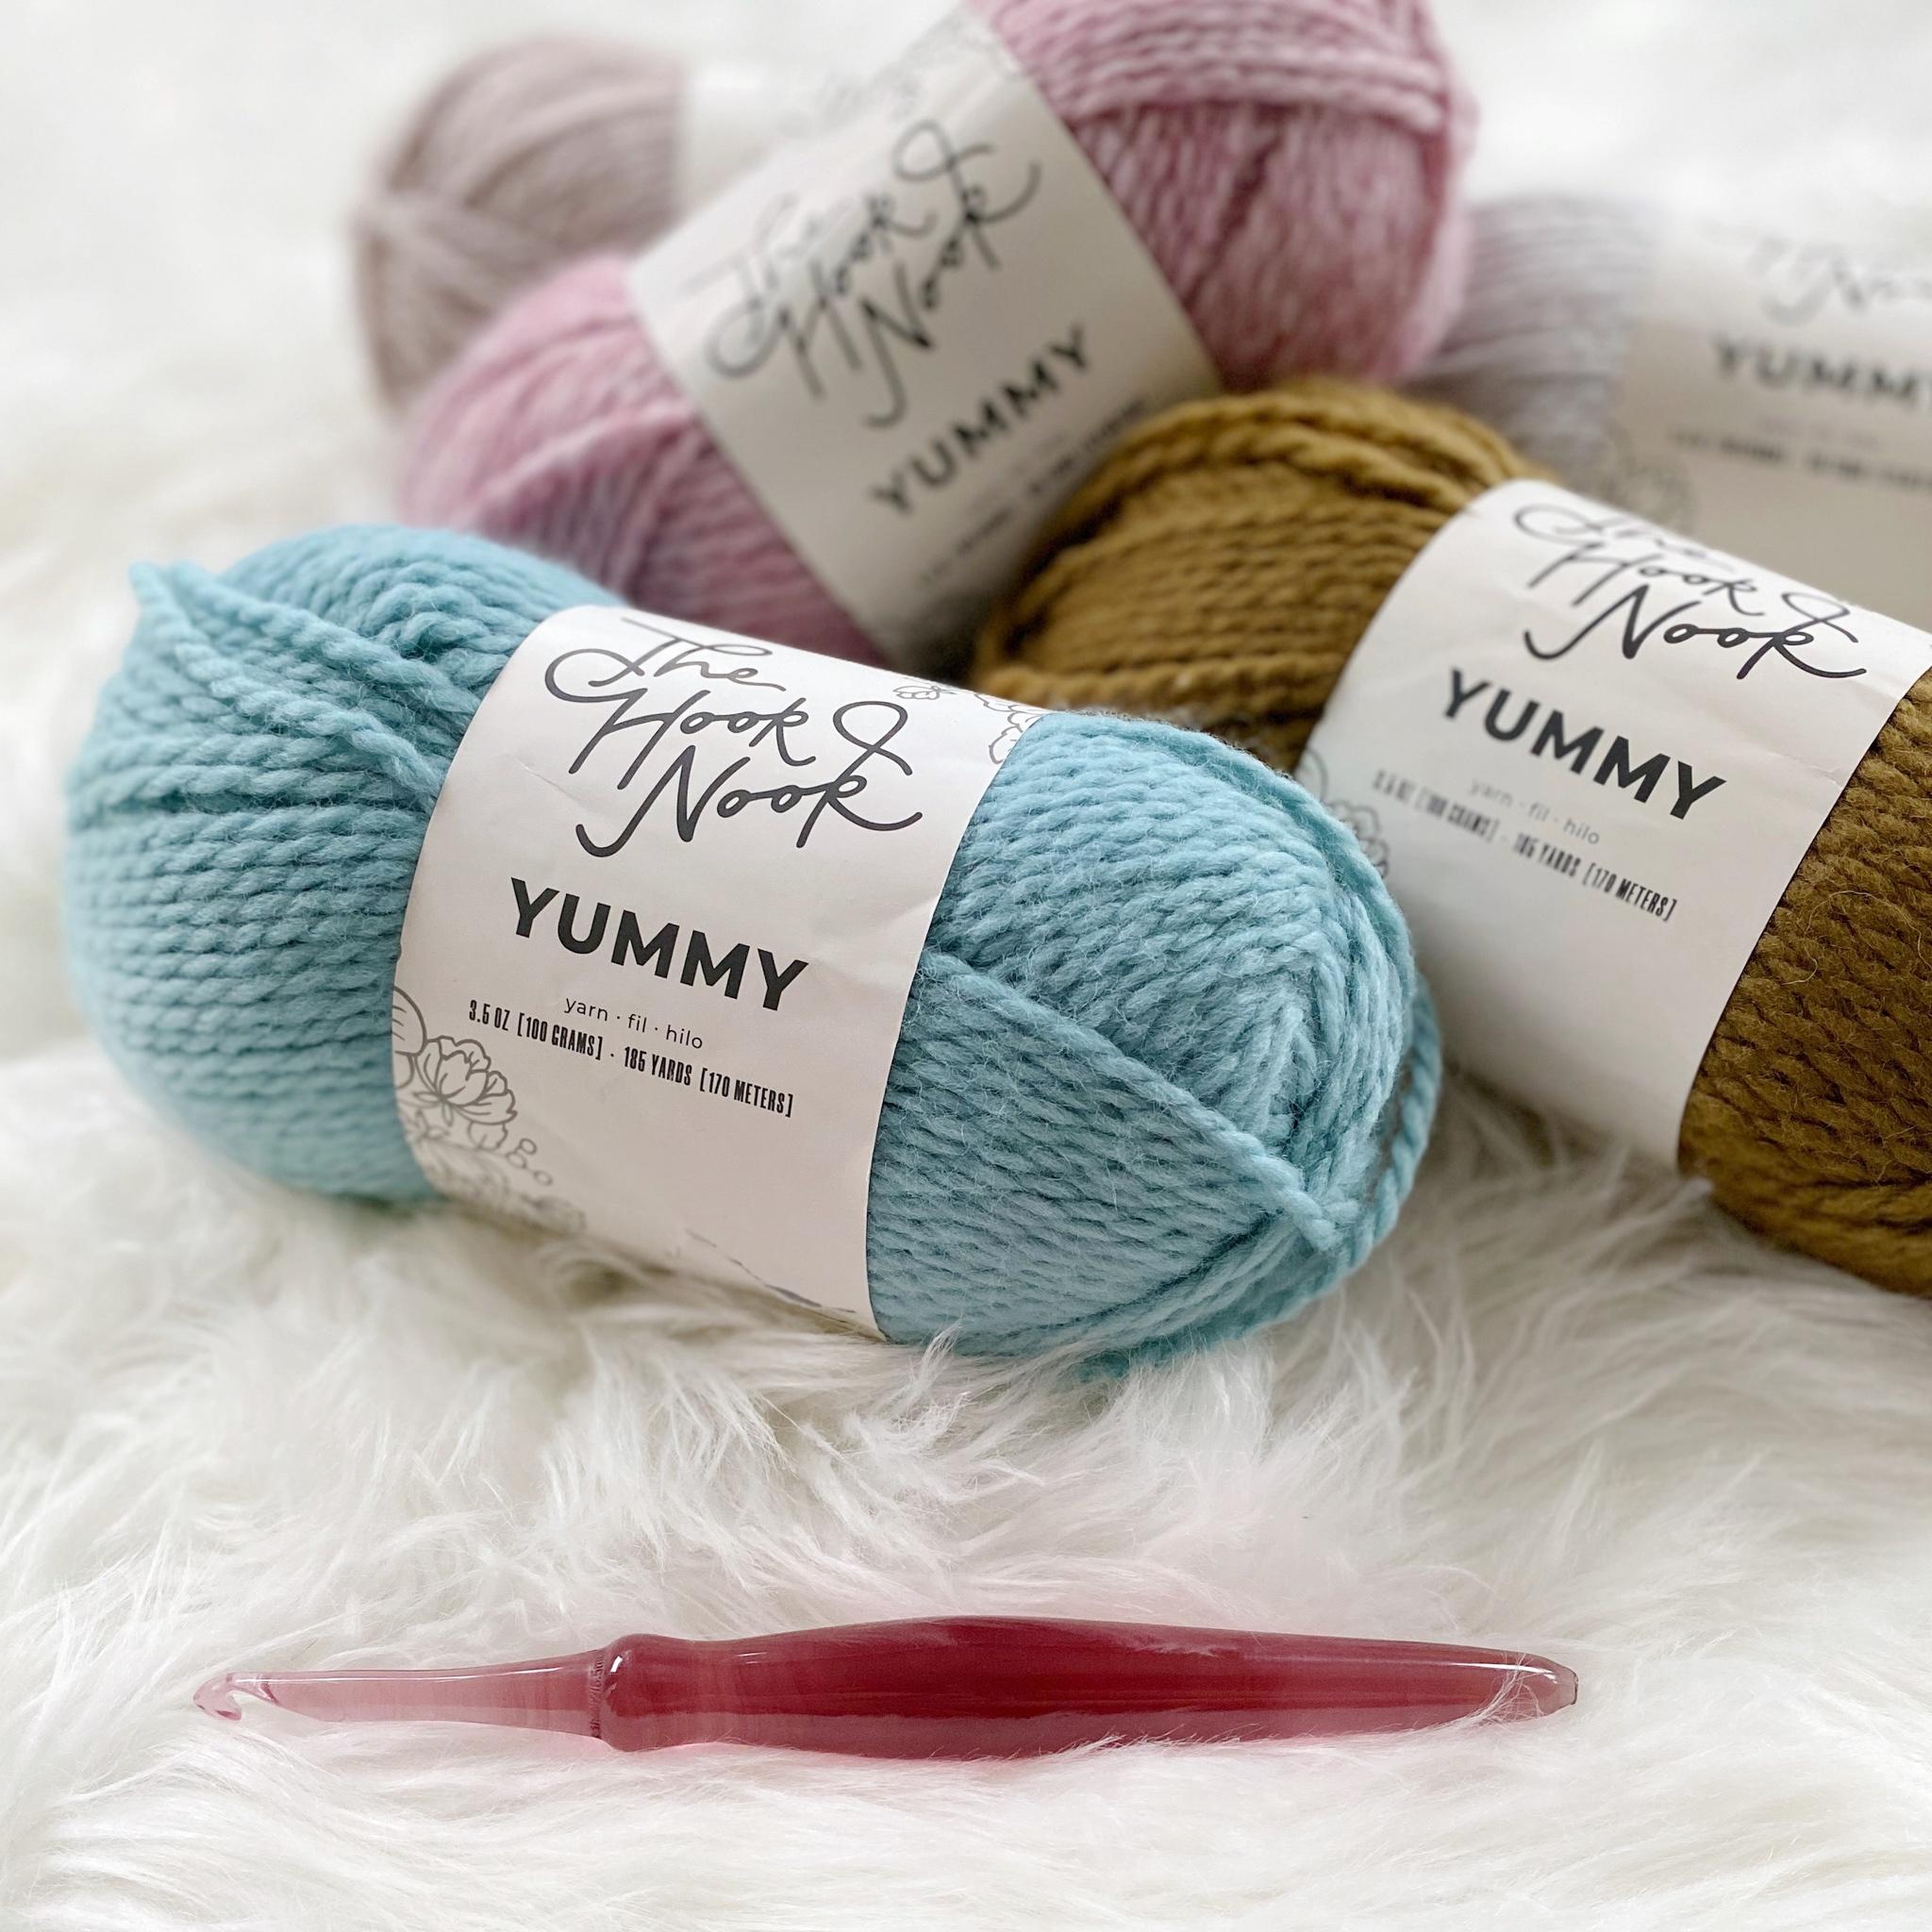 The Hook Nook Yummy Yarn